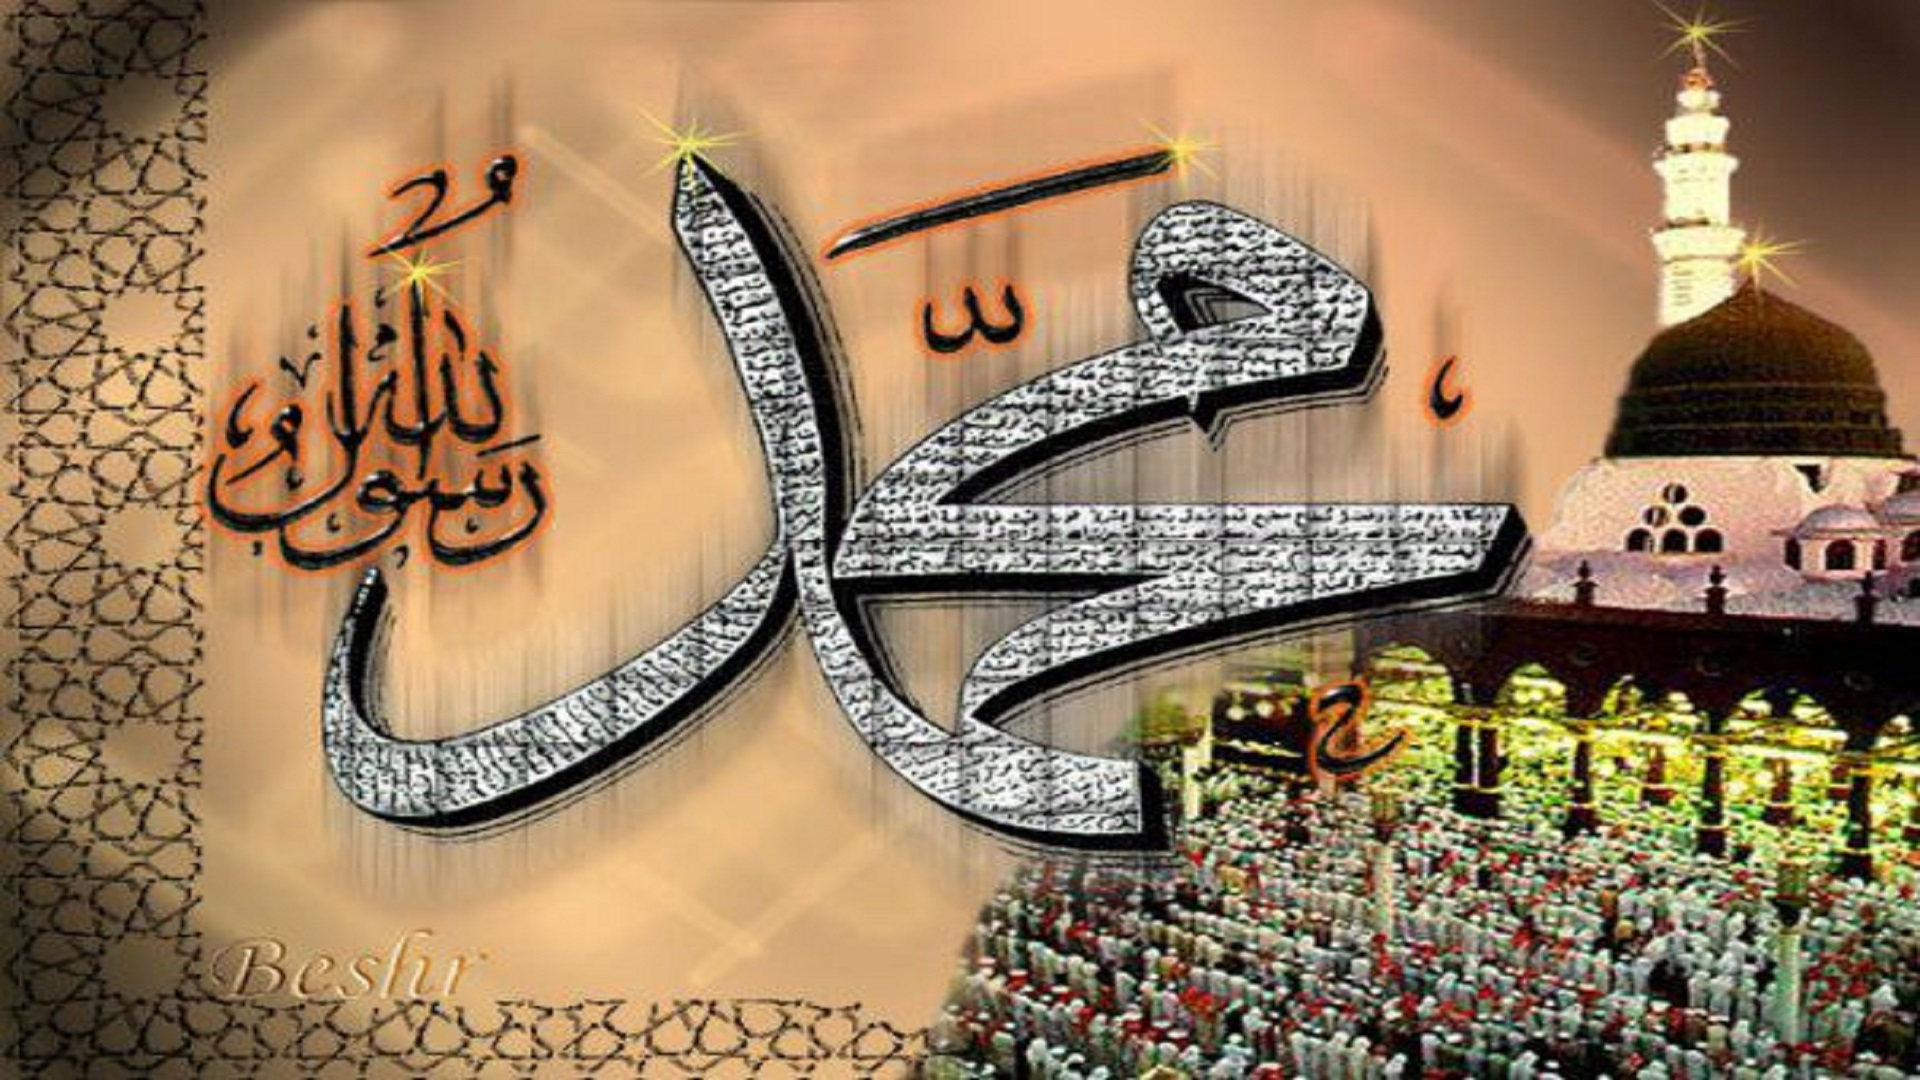 Beautiful-Muhammad-Pbuh-Wallpapers-Hd-For-Desktop-Free -7426